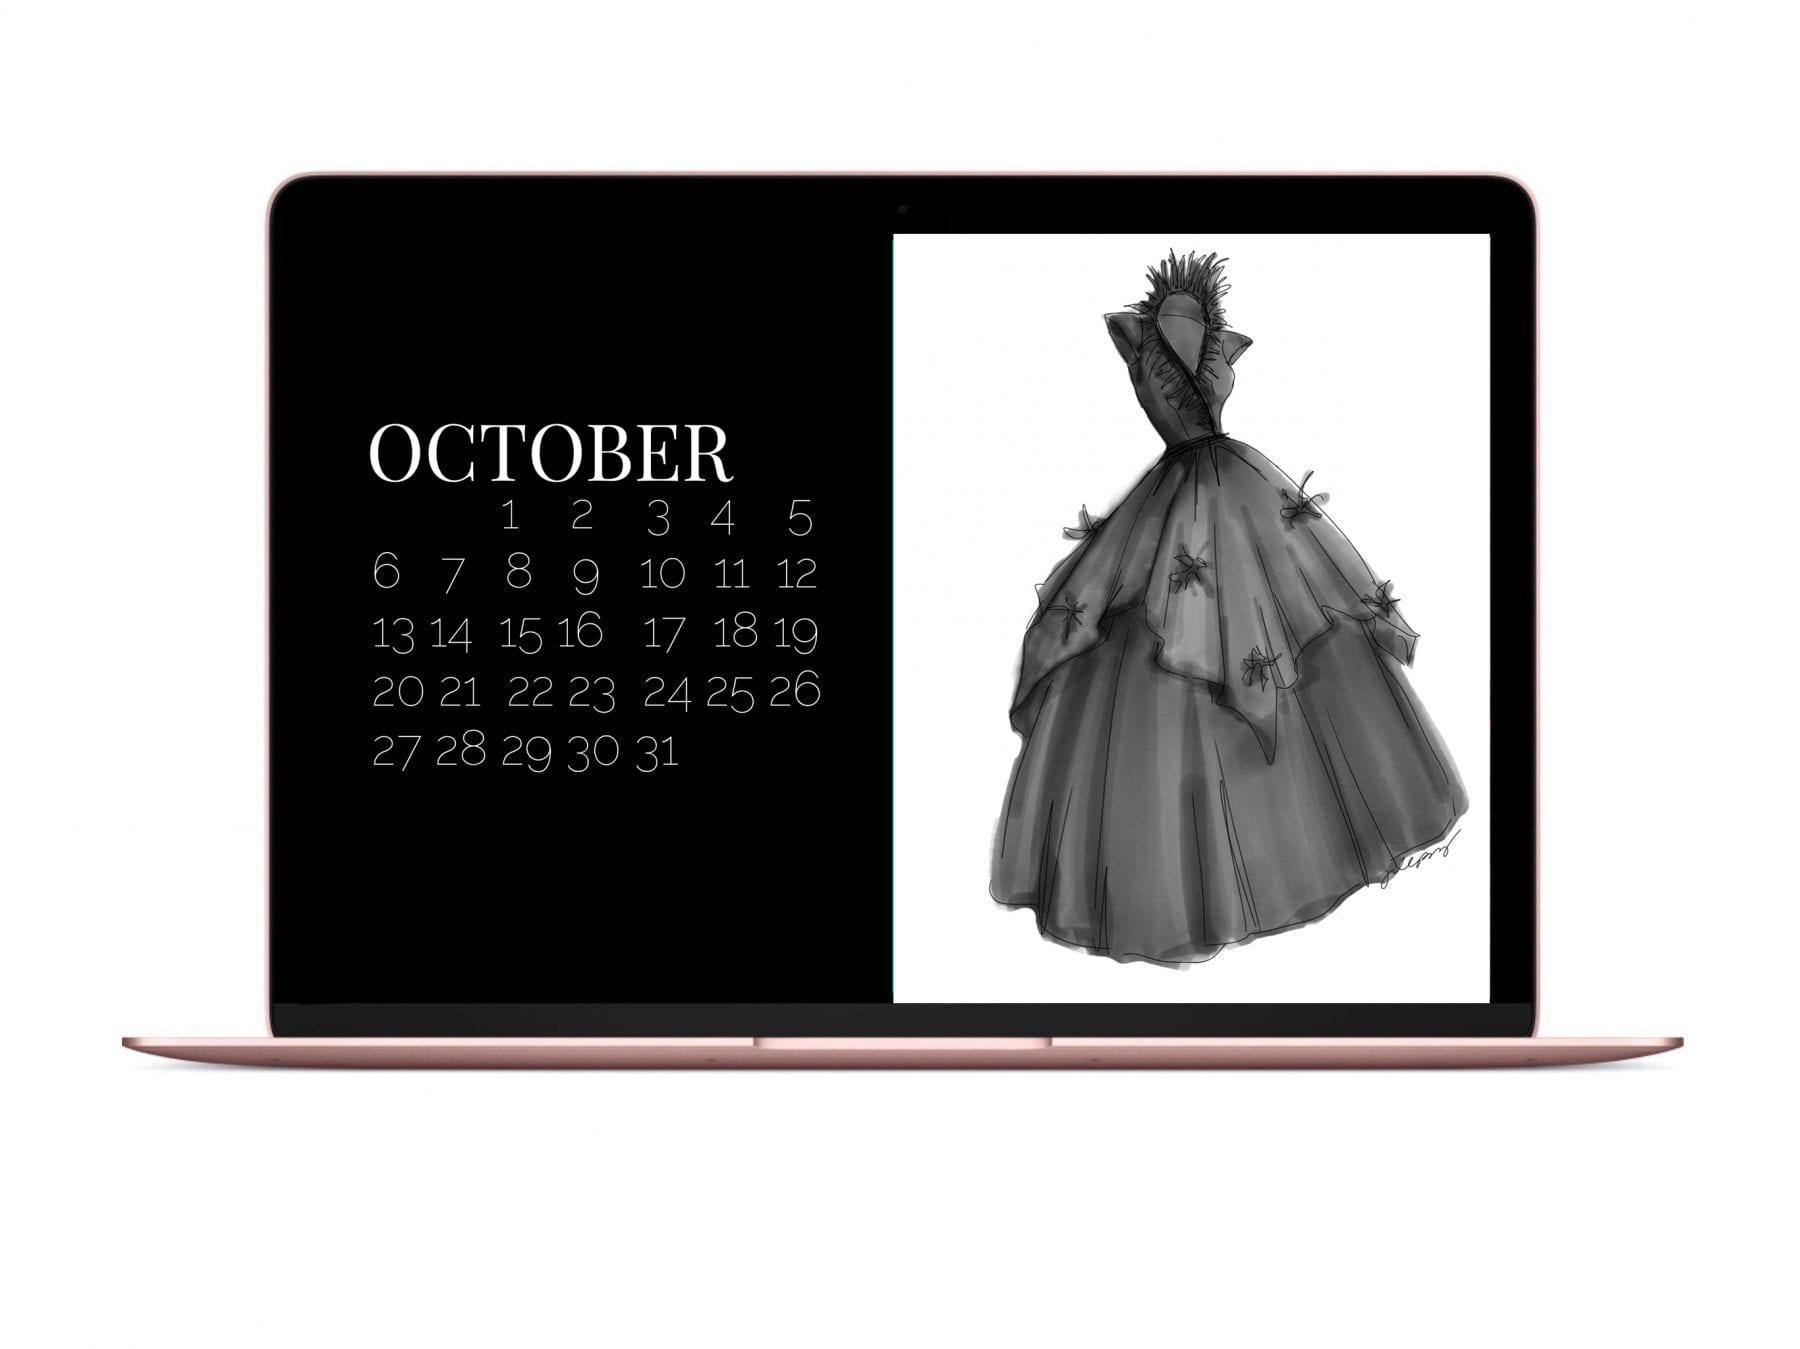 The October Dress Download